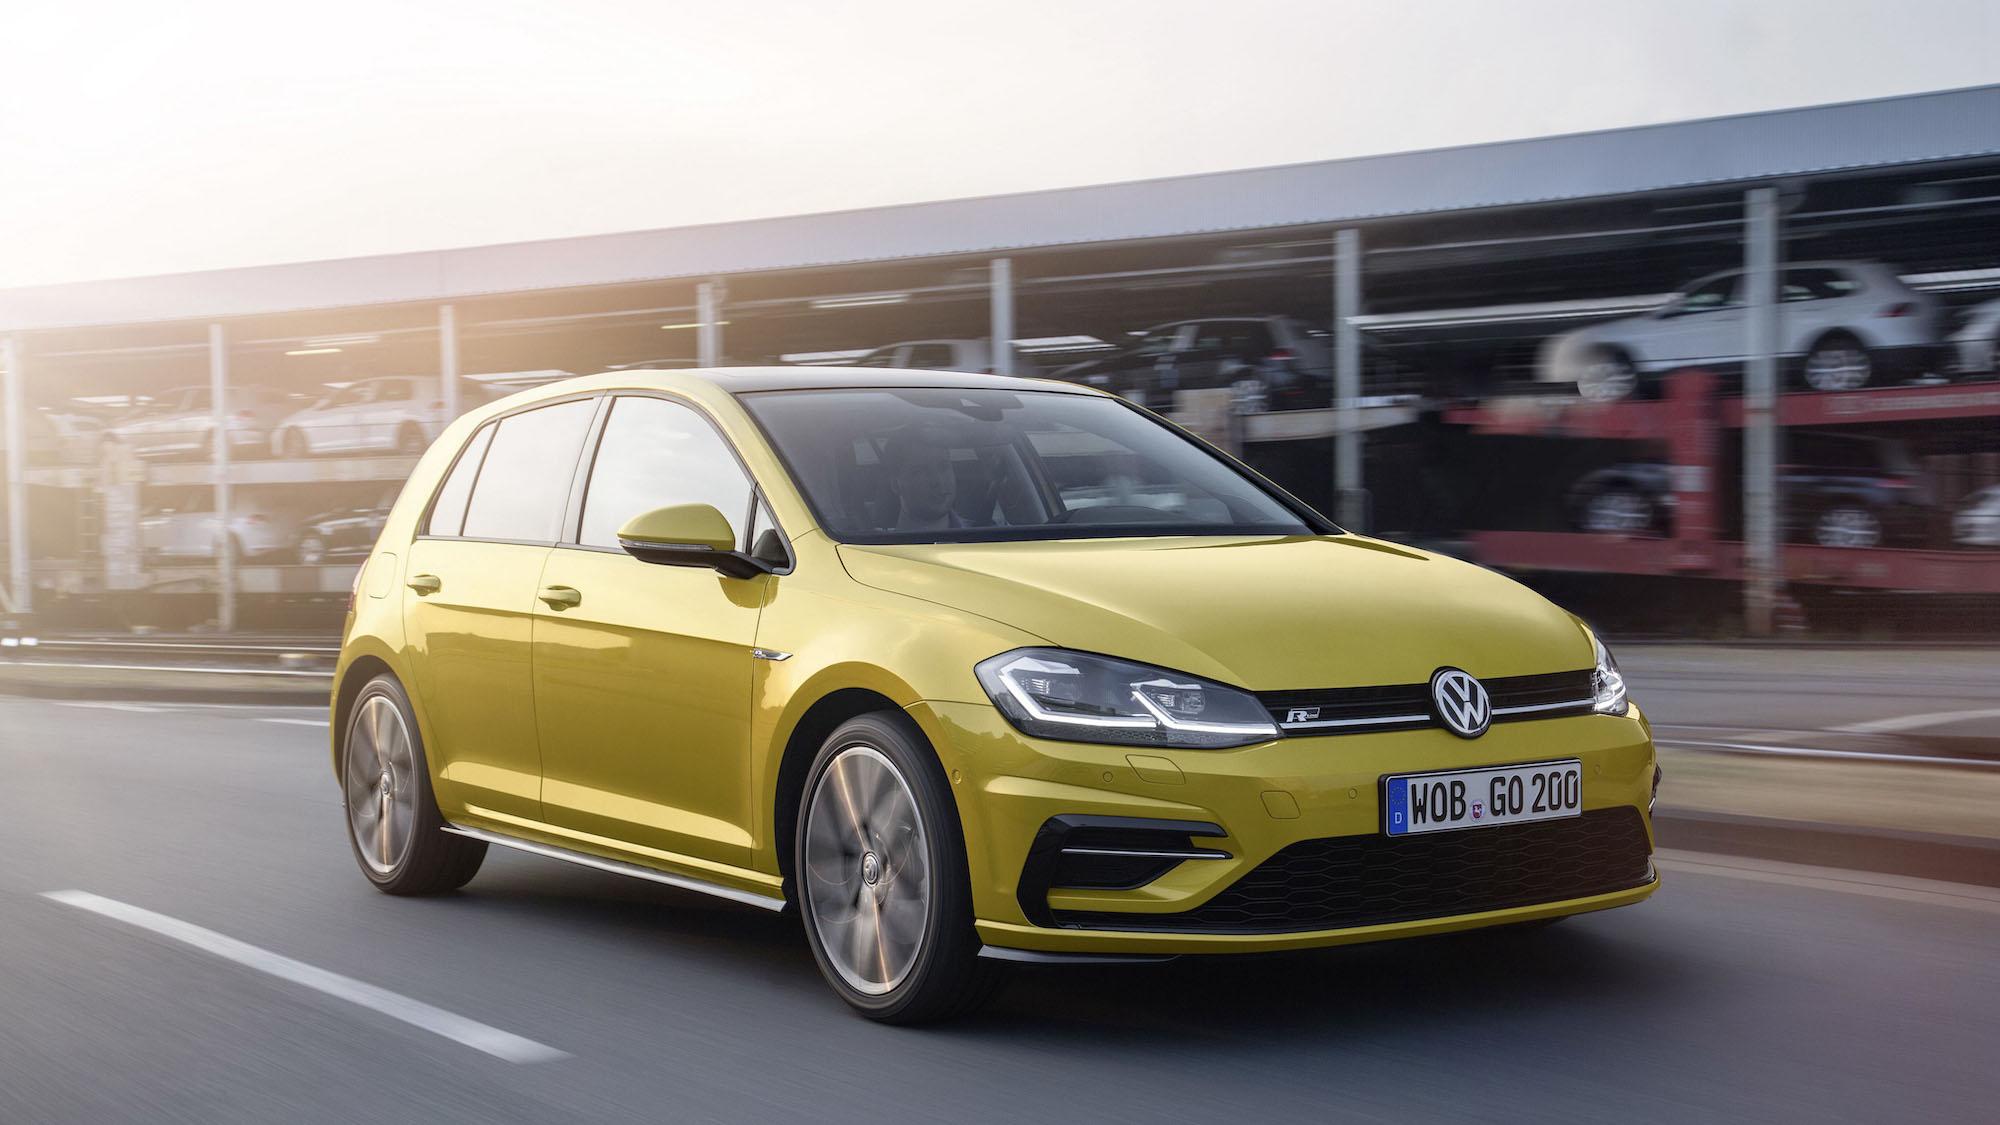 Volkswagen 微型展示中心限時進駐台中三井 Outlet,試乘拿好禮